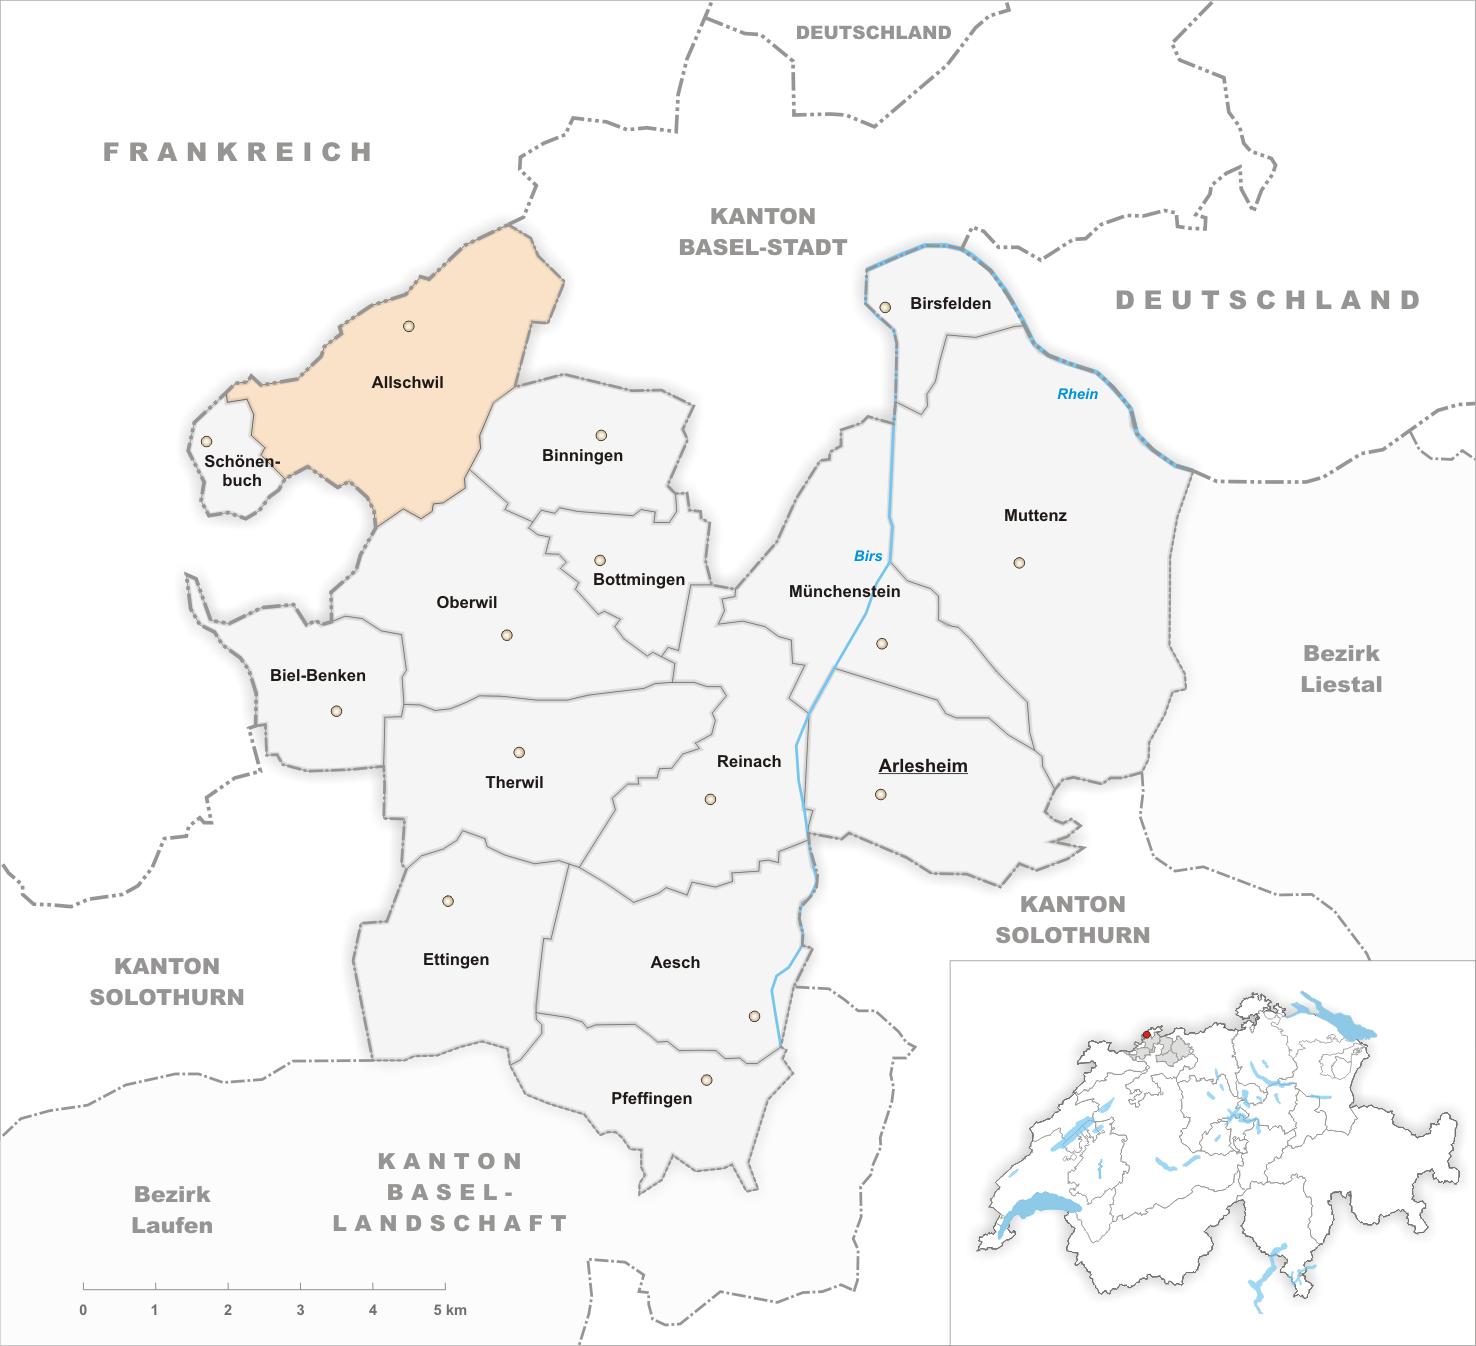 FileKarte Gemeinde Allschwil 2007png Wikimedia Commons